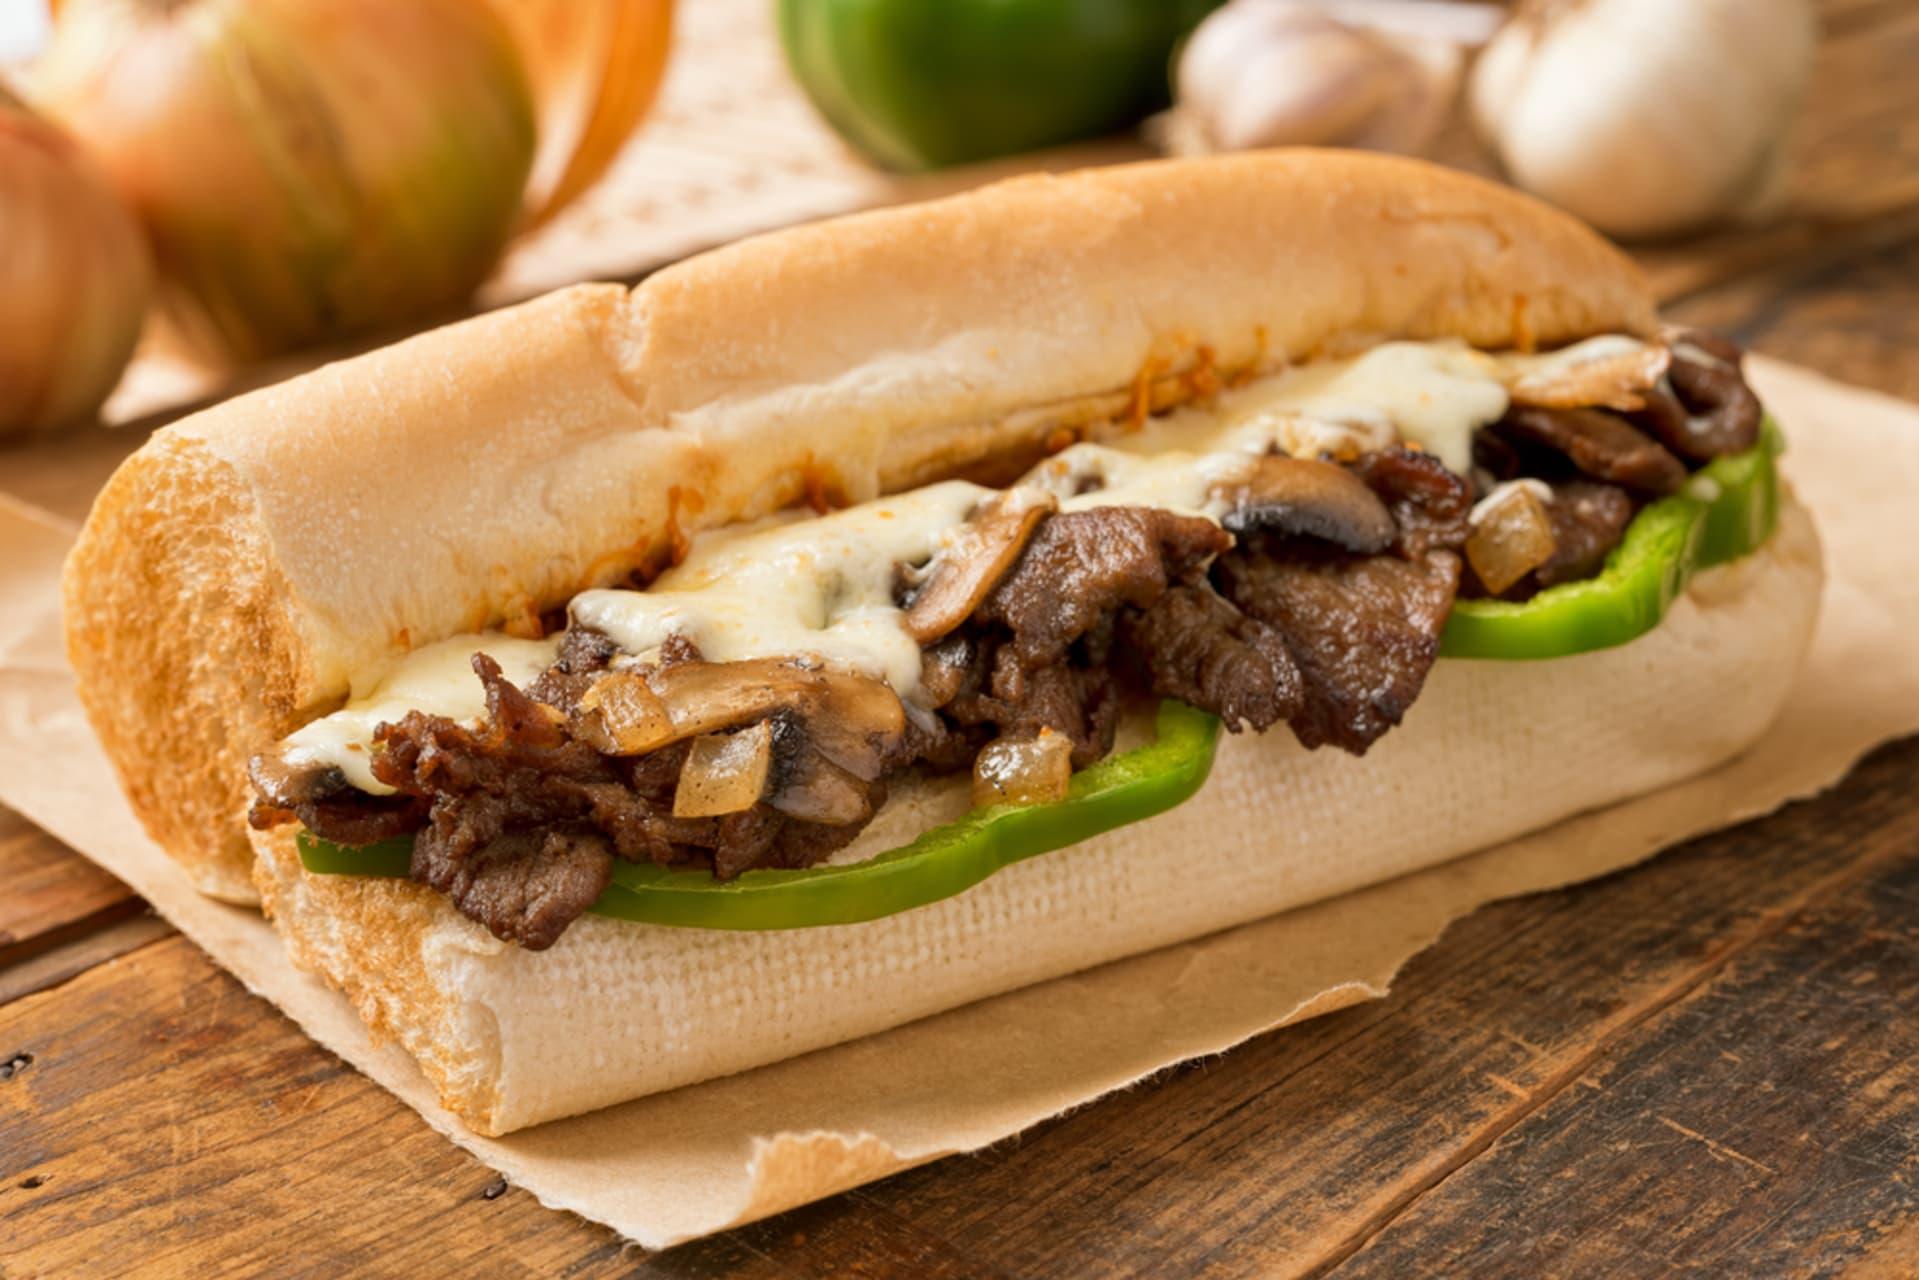 Philadelphia - Let's make a (Philly) Cheesesteak!